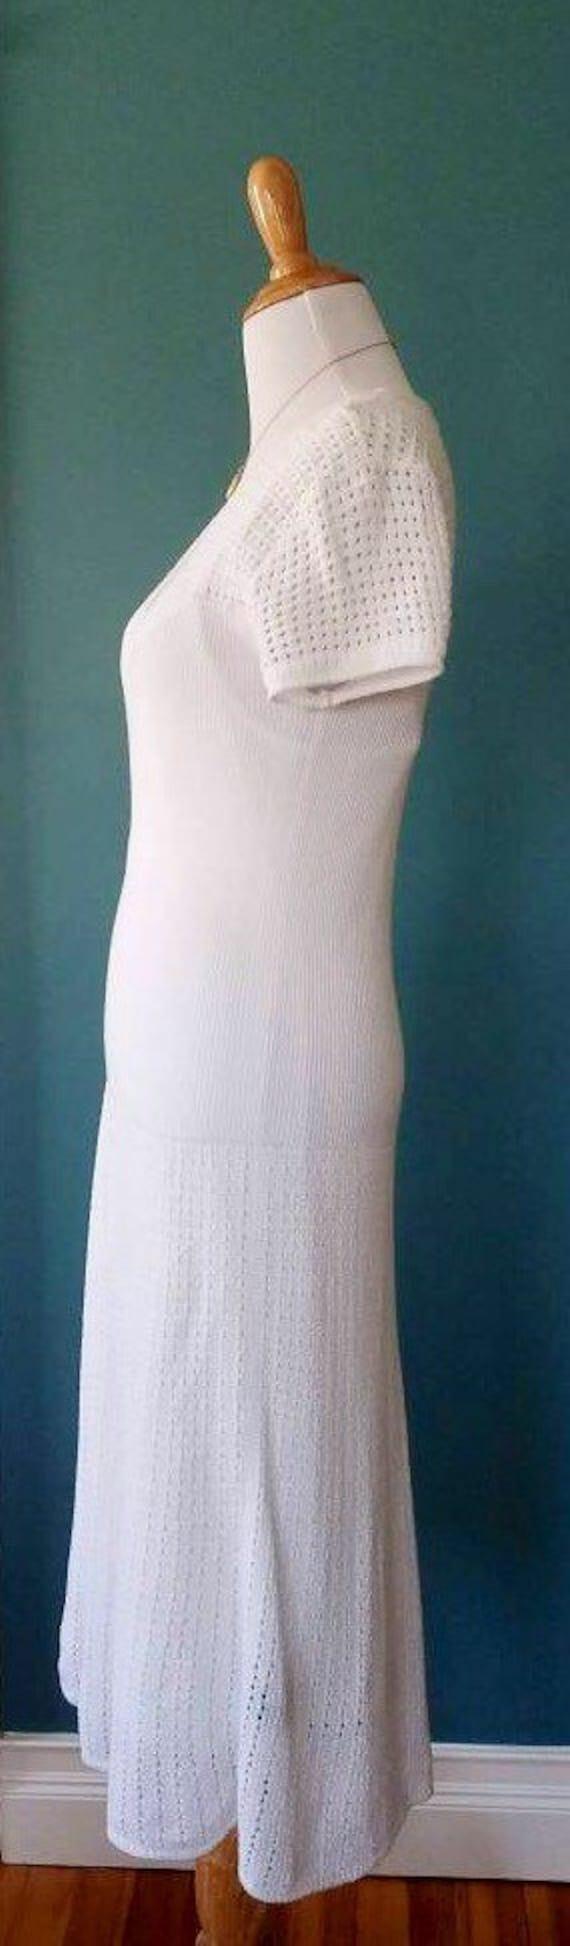 Vintage 20s // 30s // 40s Style White Knit Dress - image 5